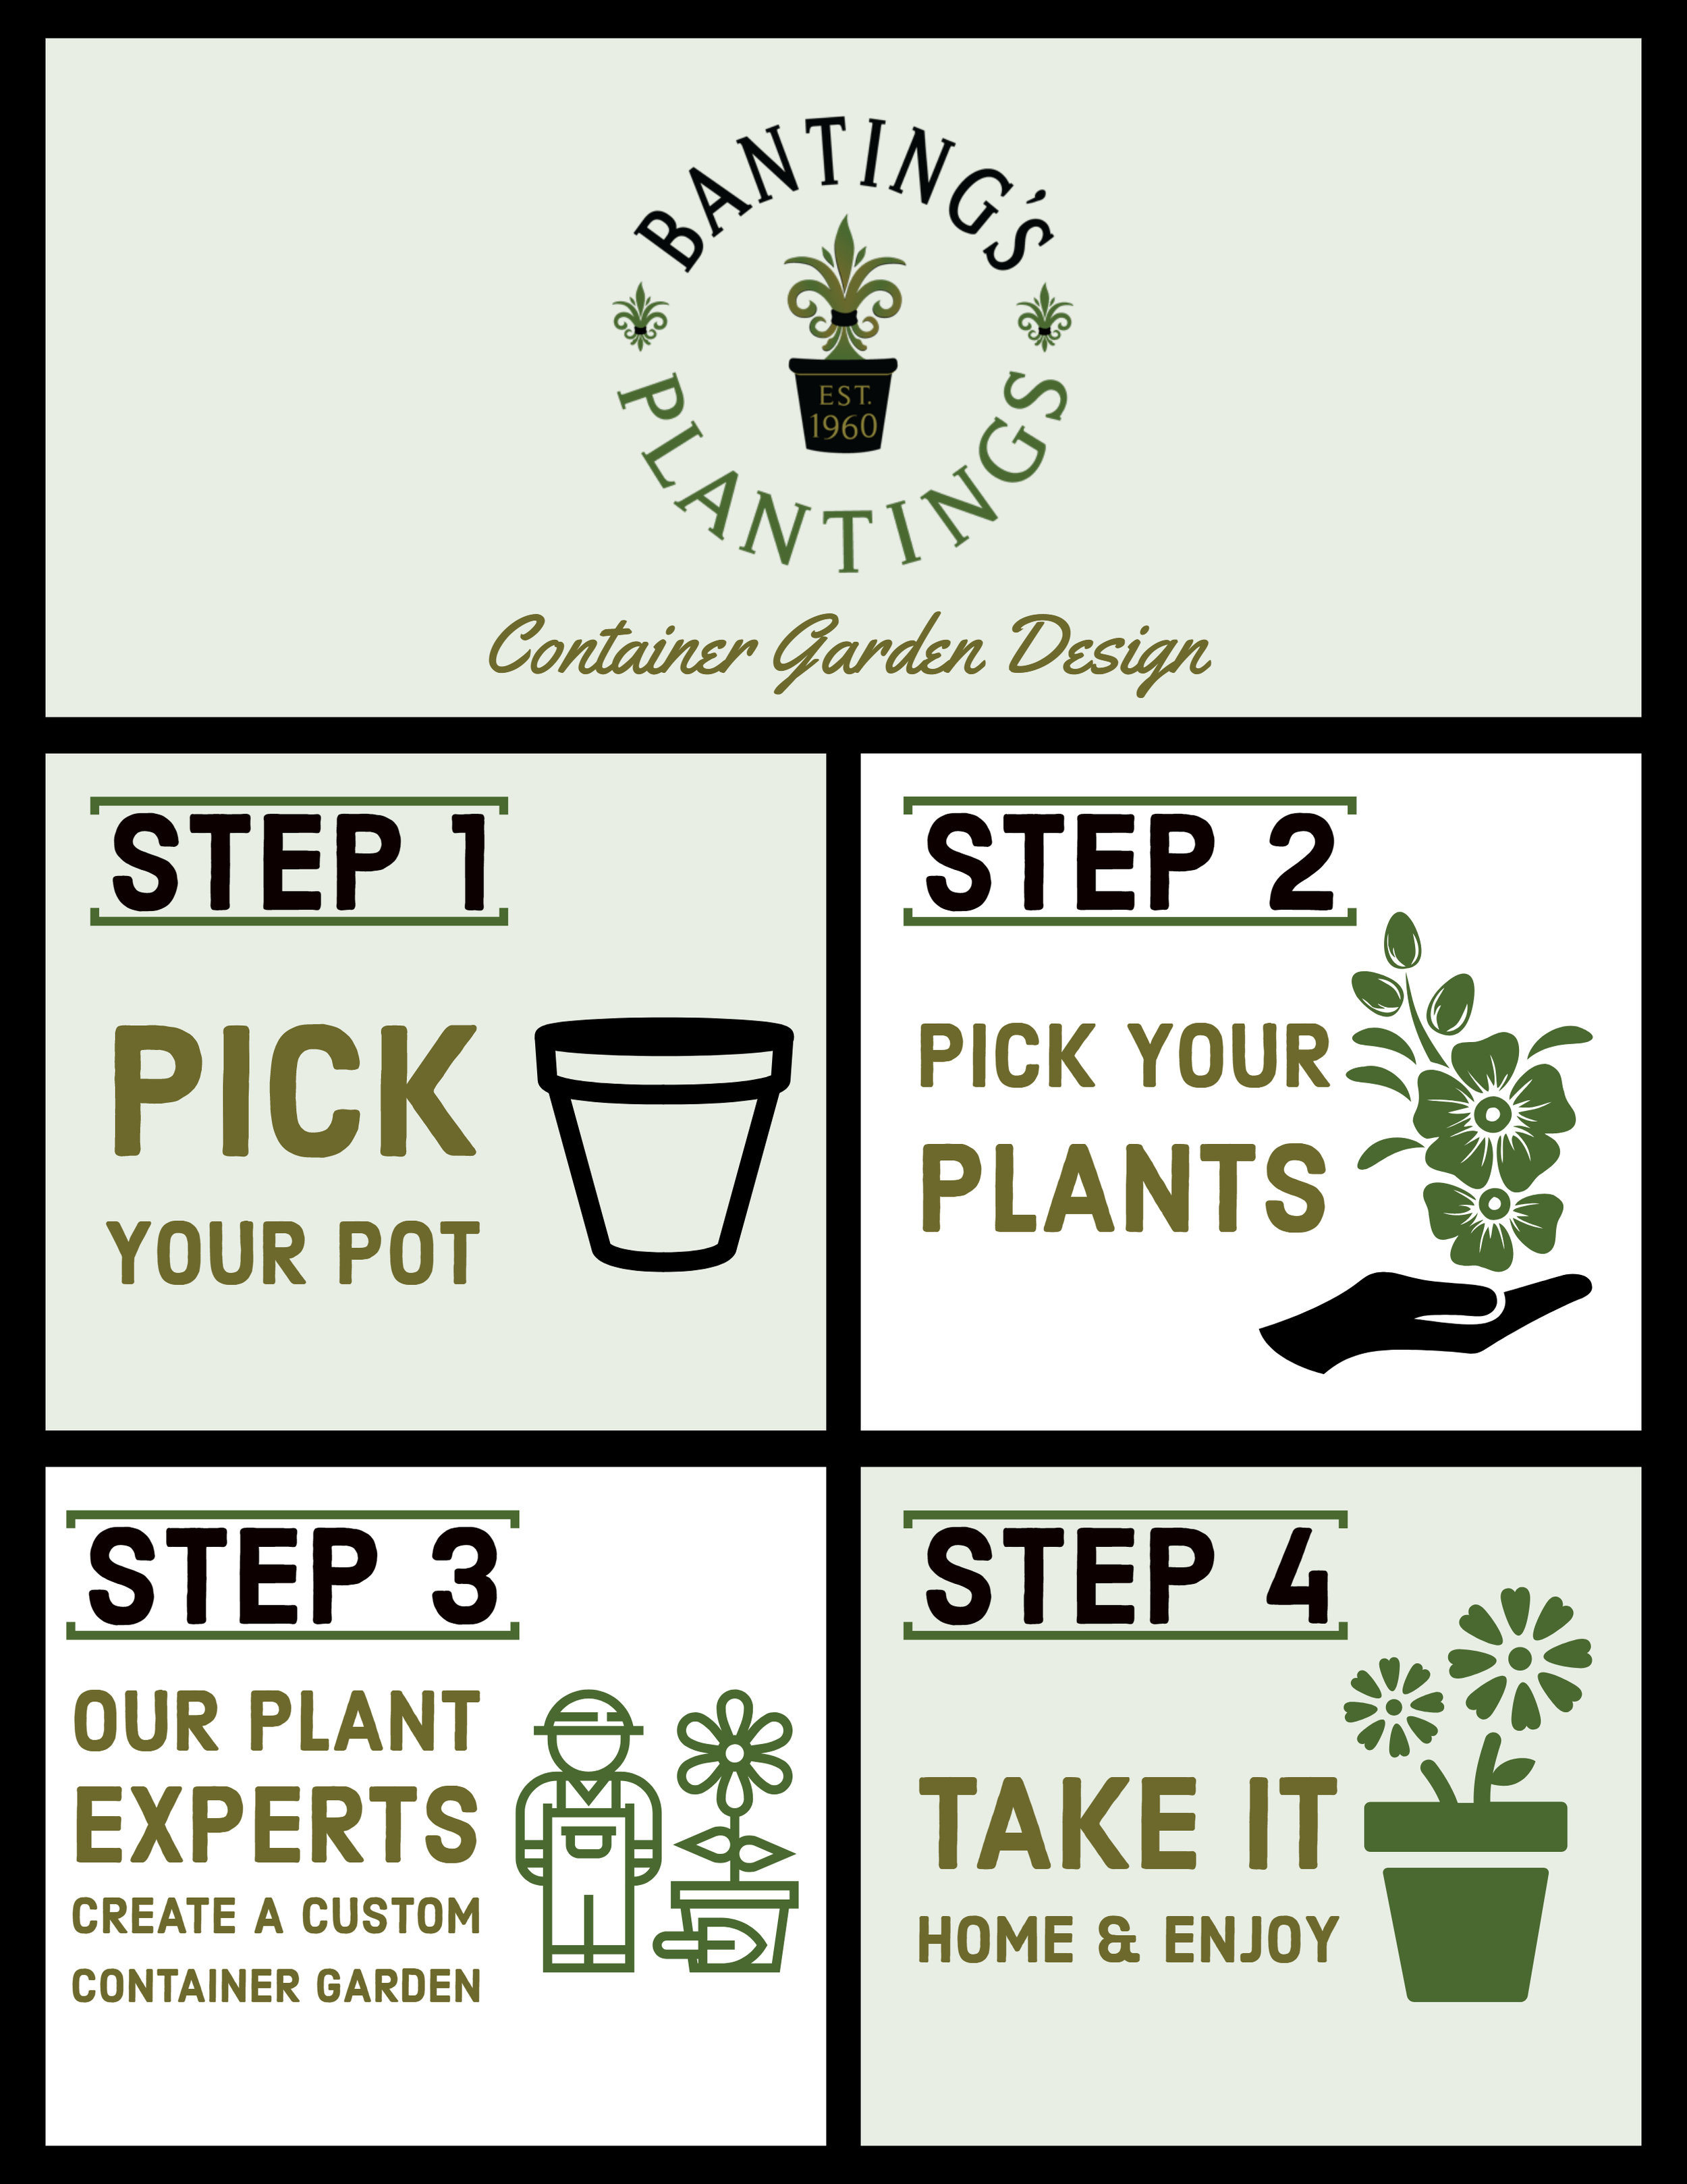 Bantingplanting.jpg